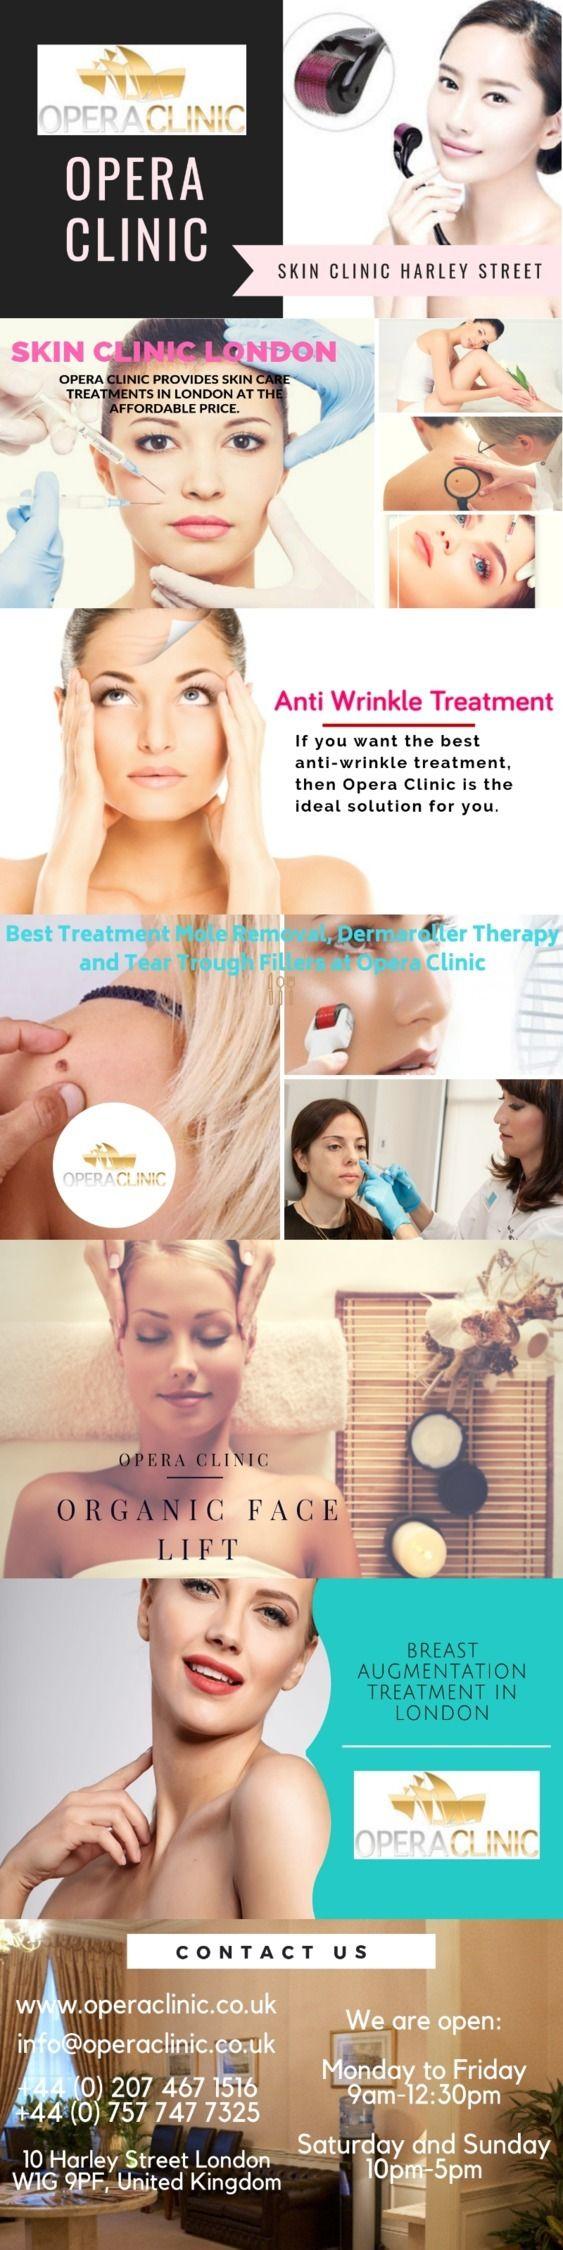 aesthetic beauty treatment pain - operaclinic | ello